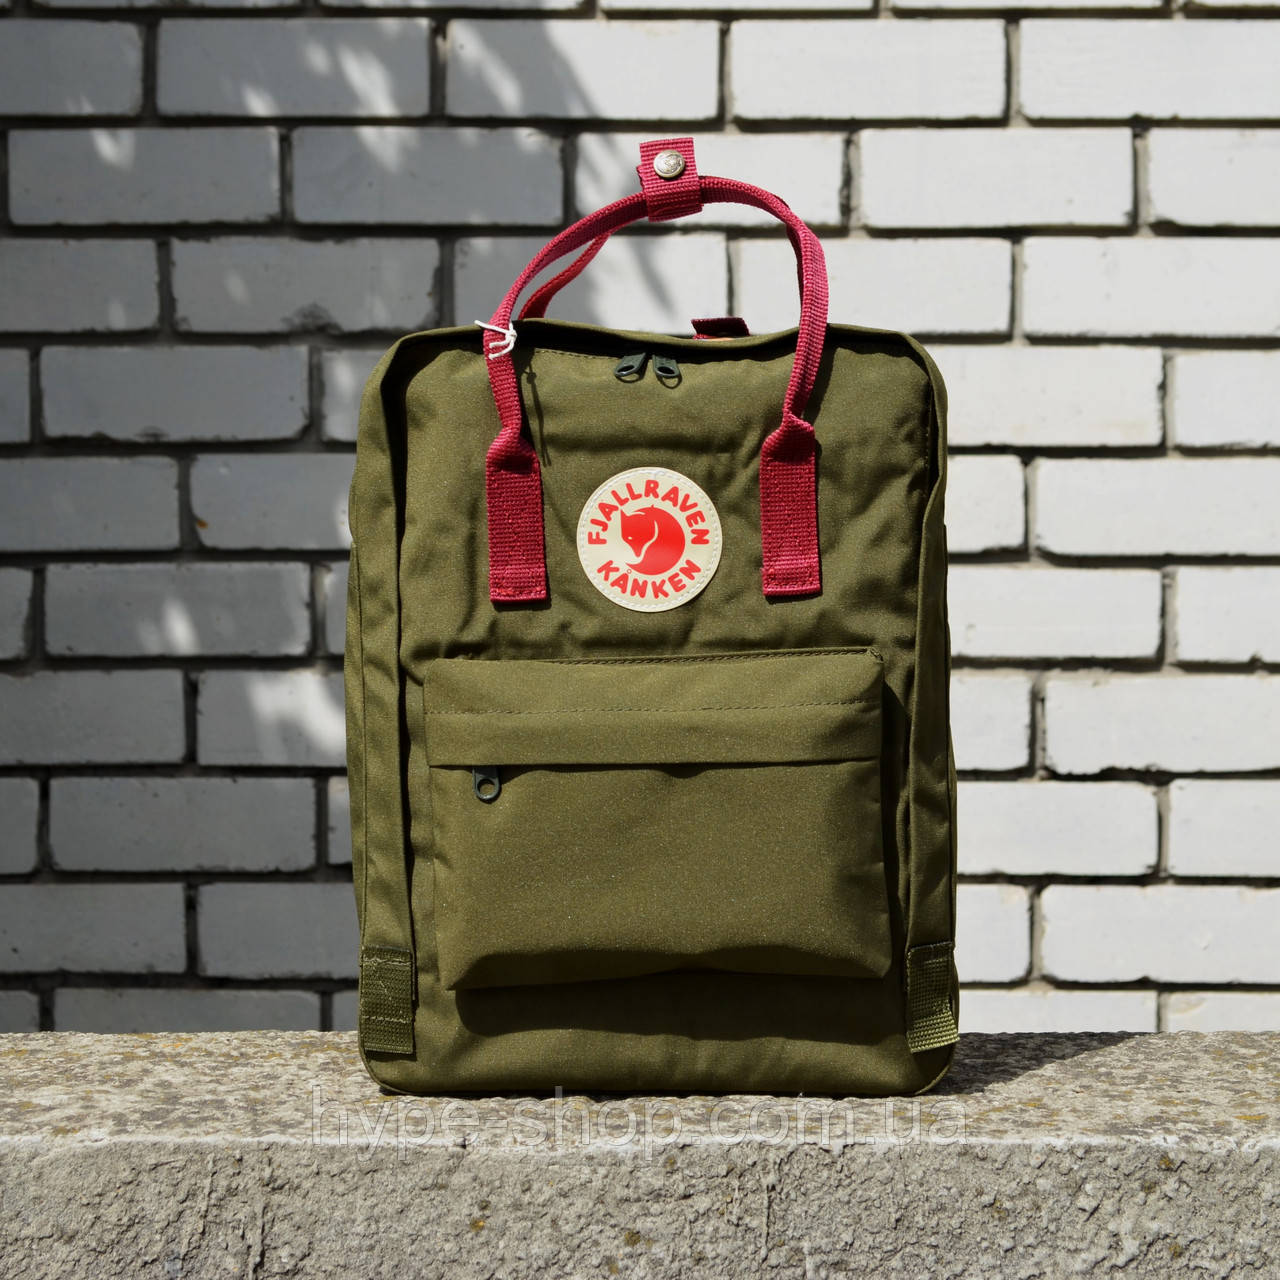 Рюкзак Kanken Classic Хакі репліка